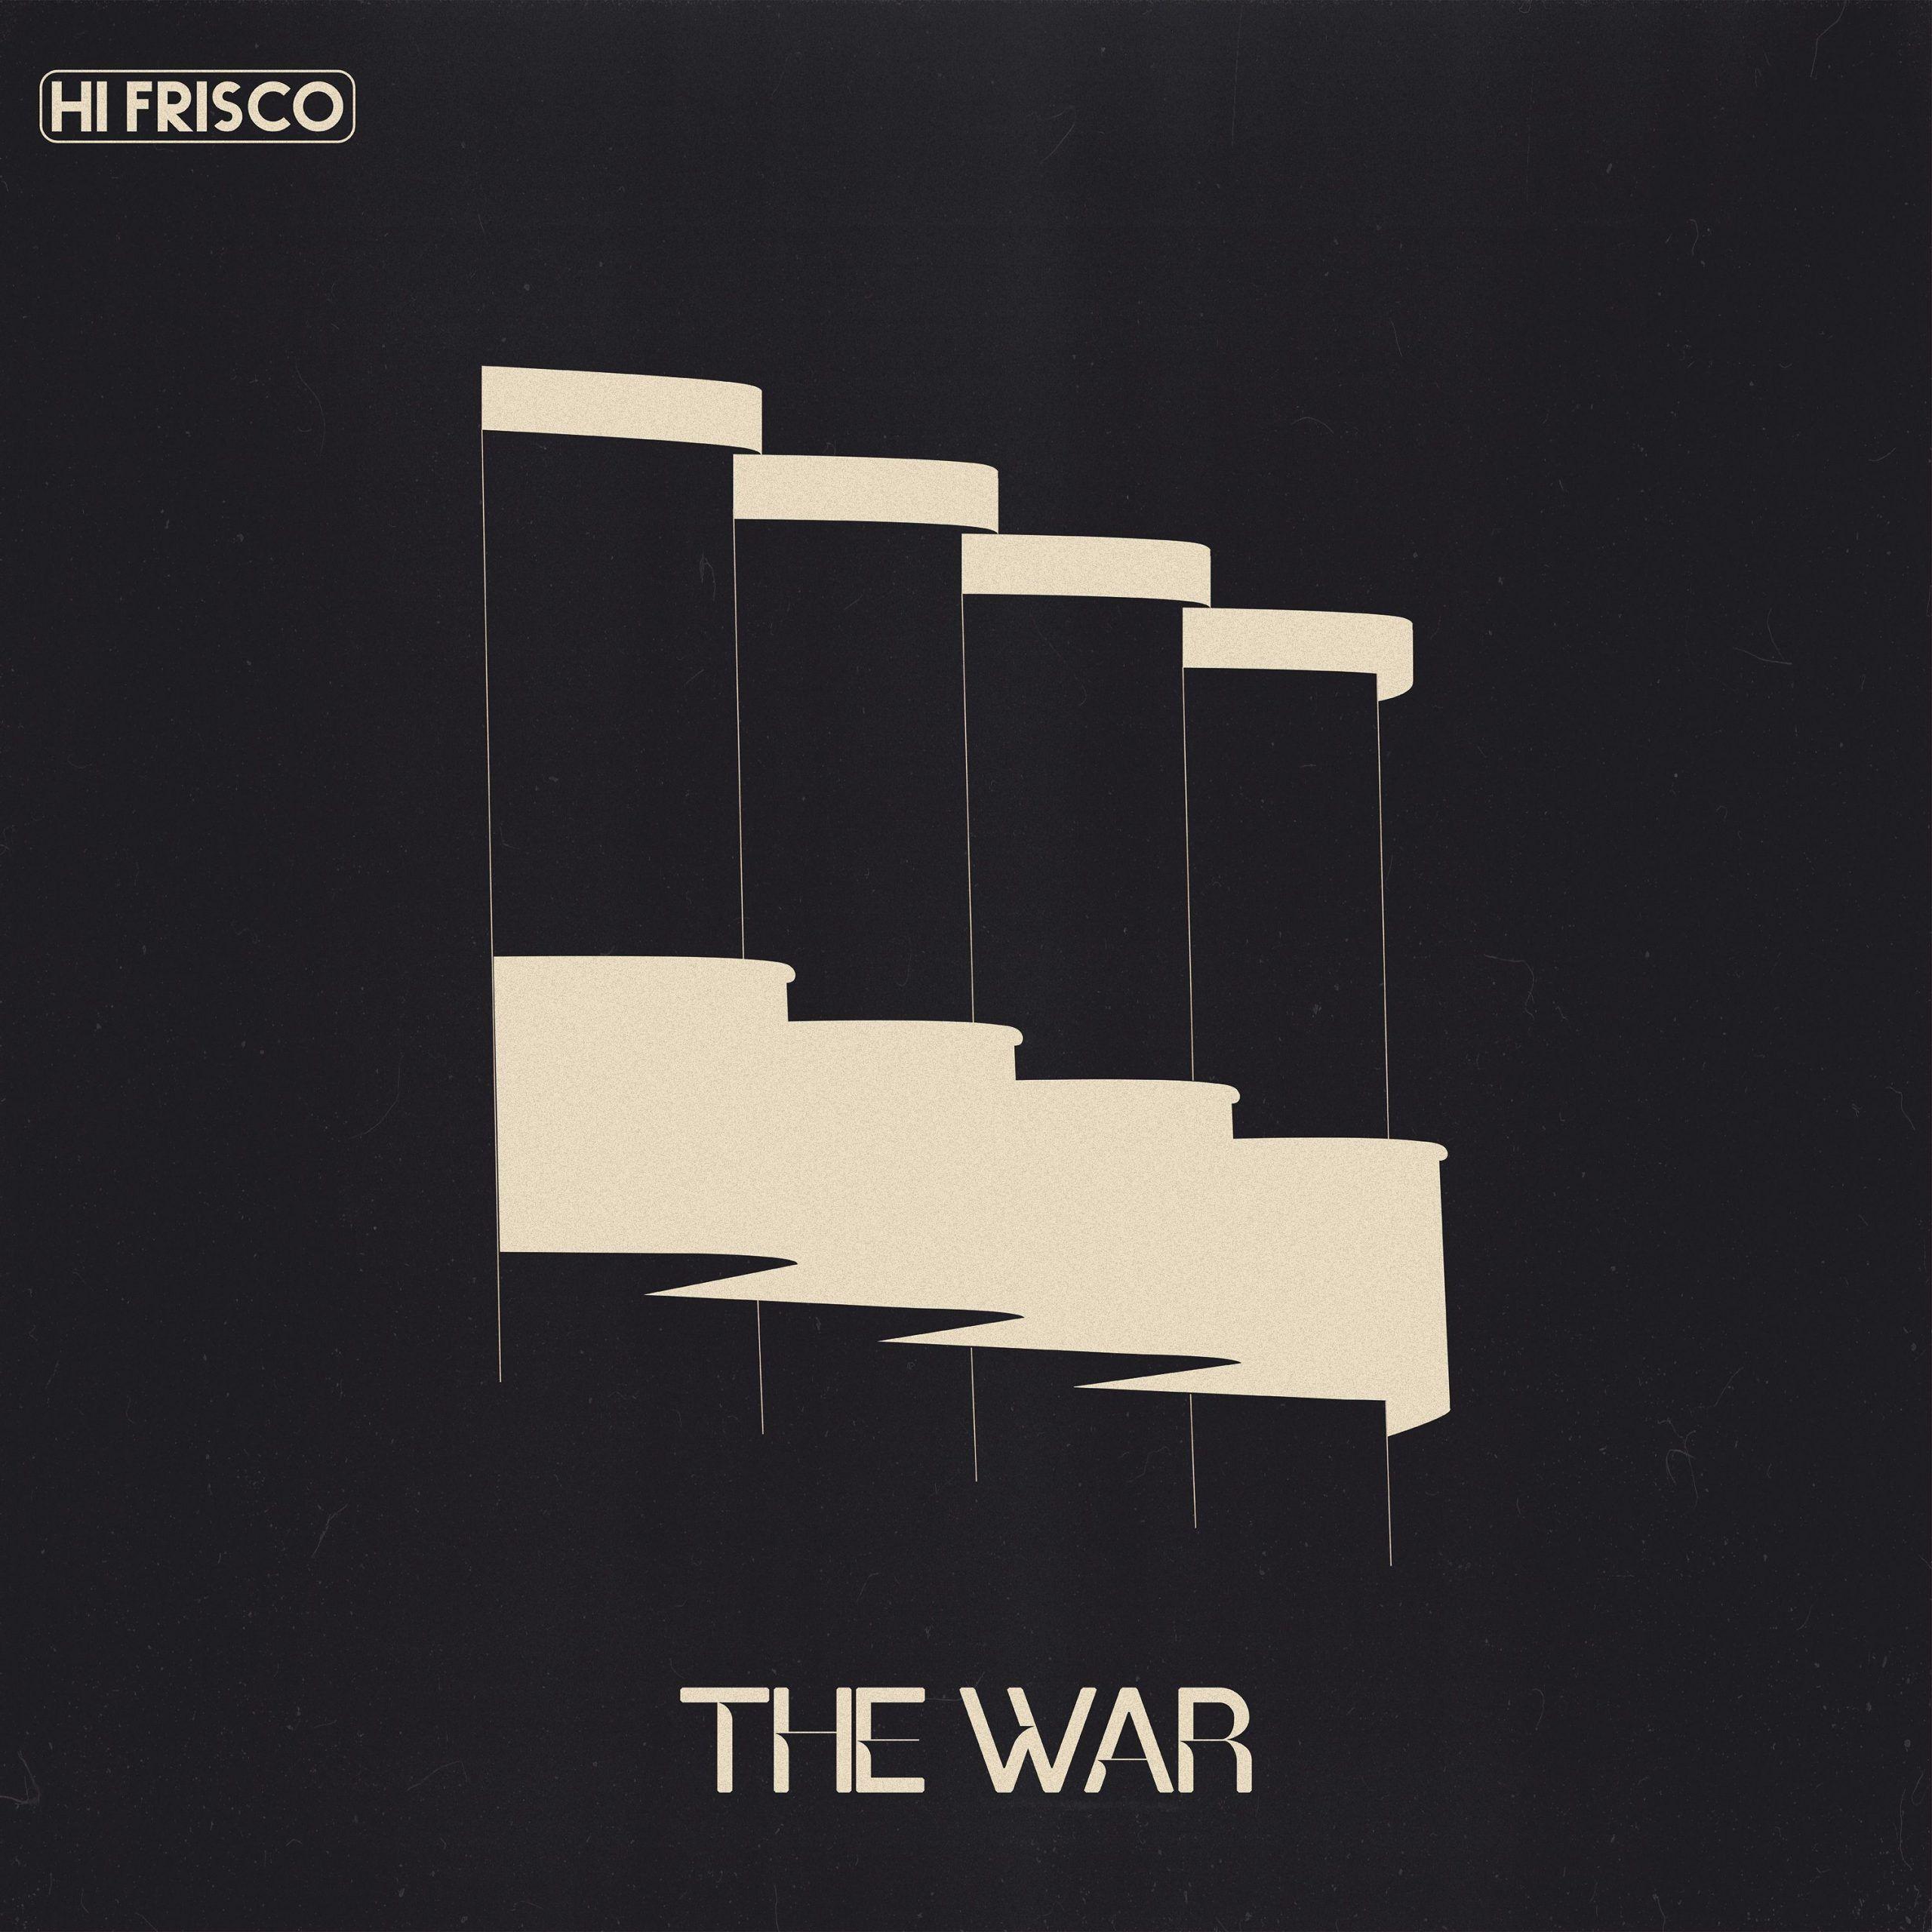 hi-frisco-the-war-artwork-scaled.jpg